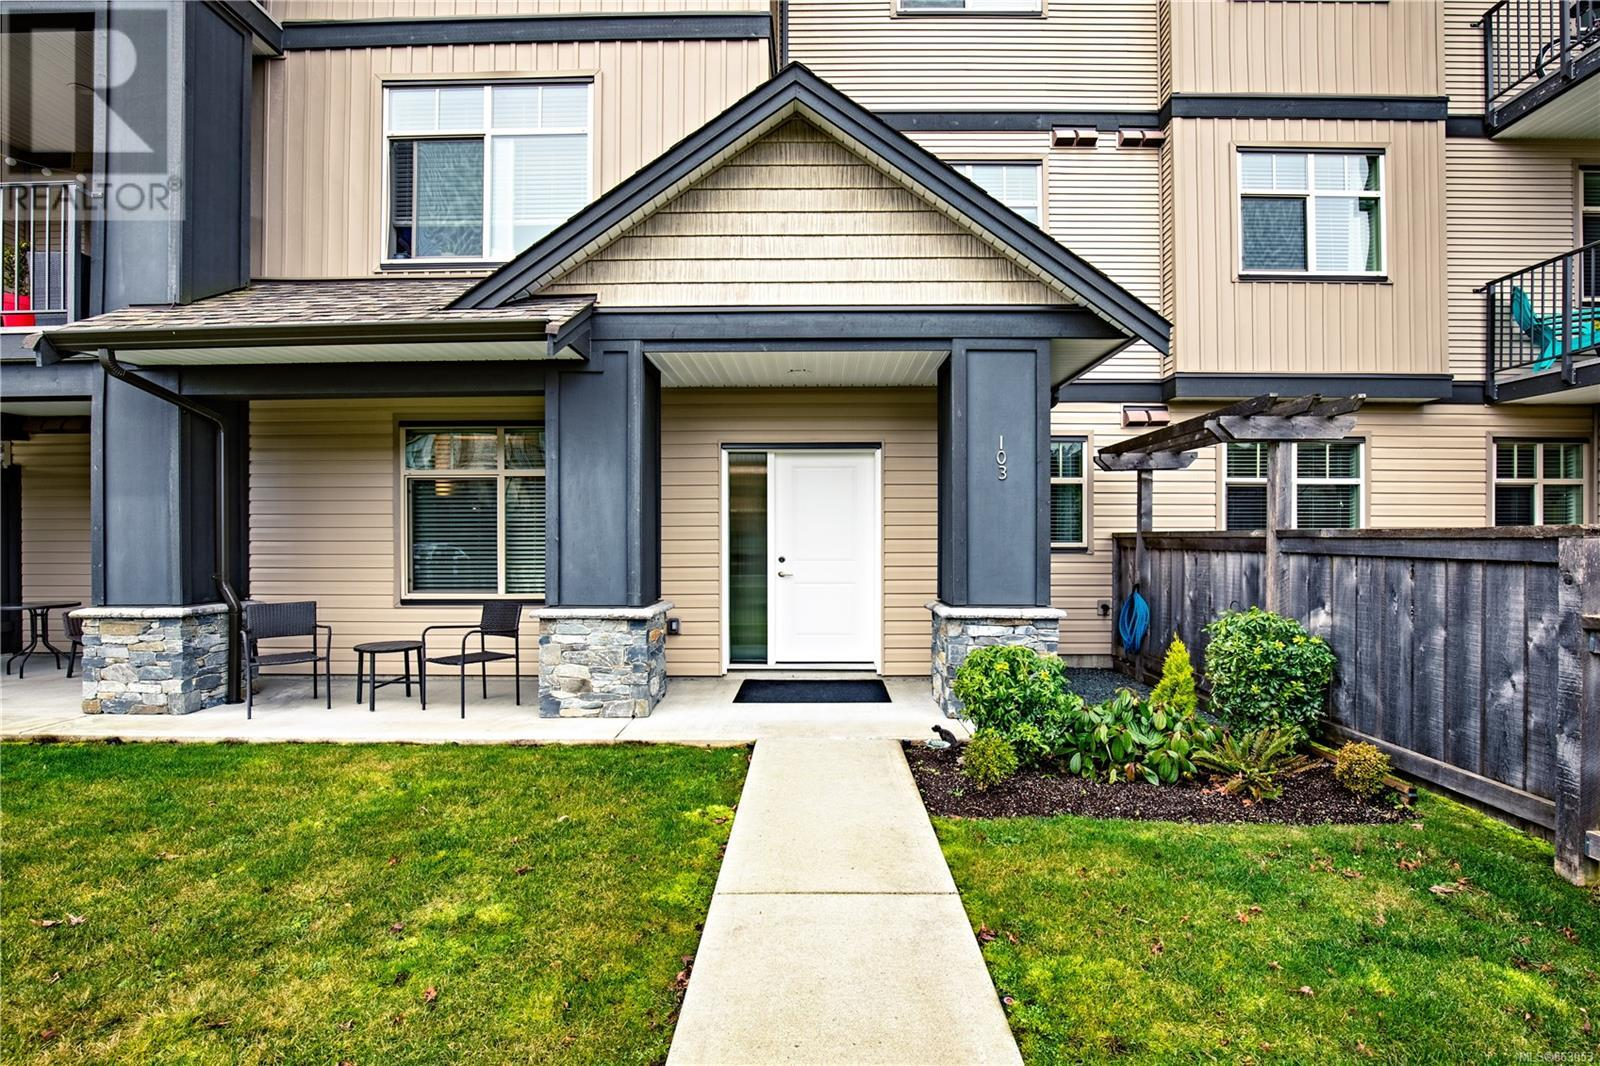 103 1900 Tulsa Rd, nanaimo, British Columbia